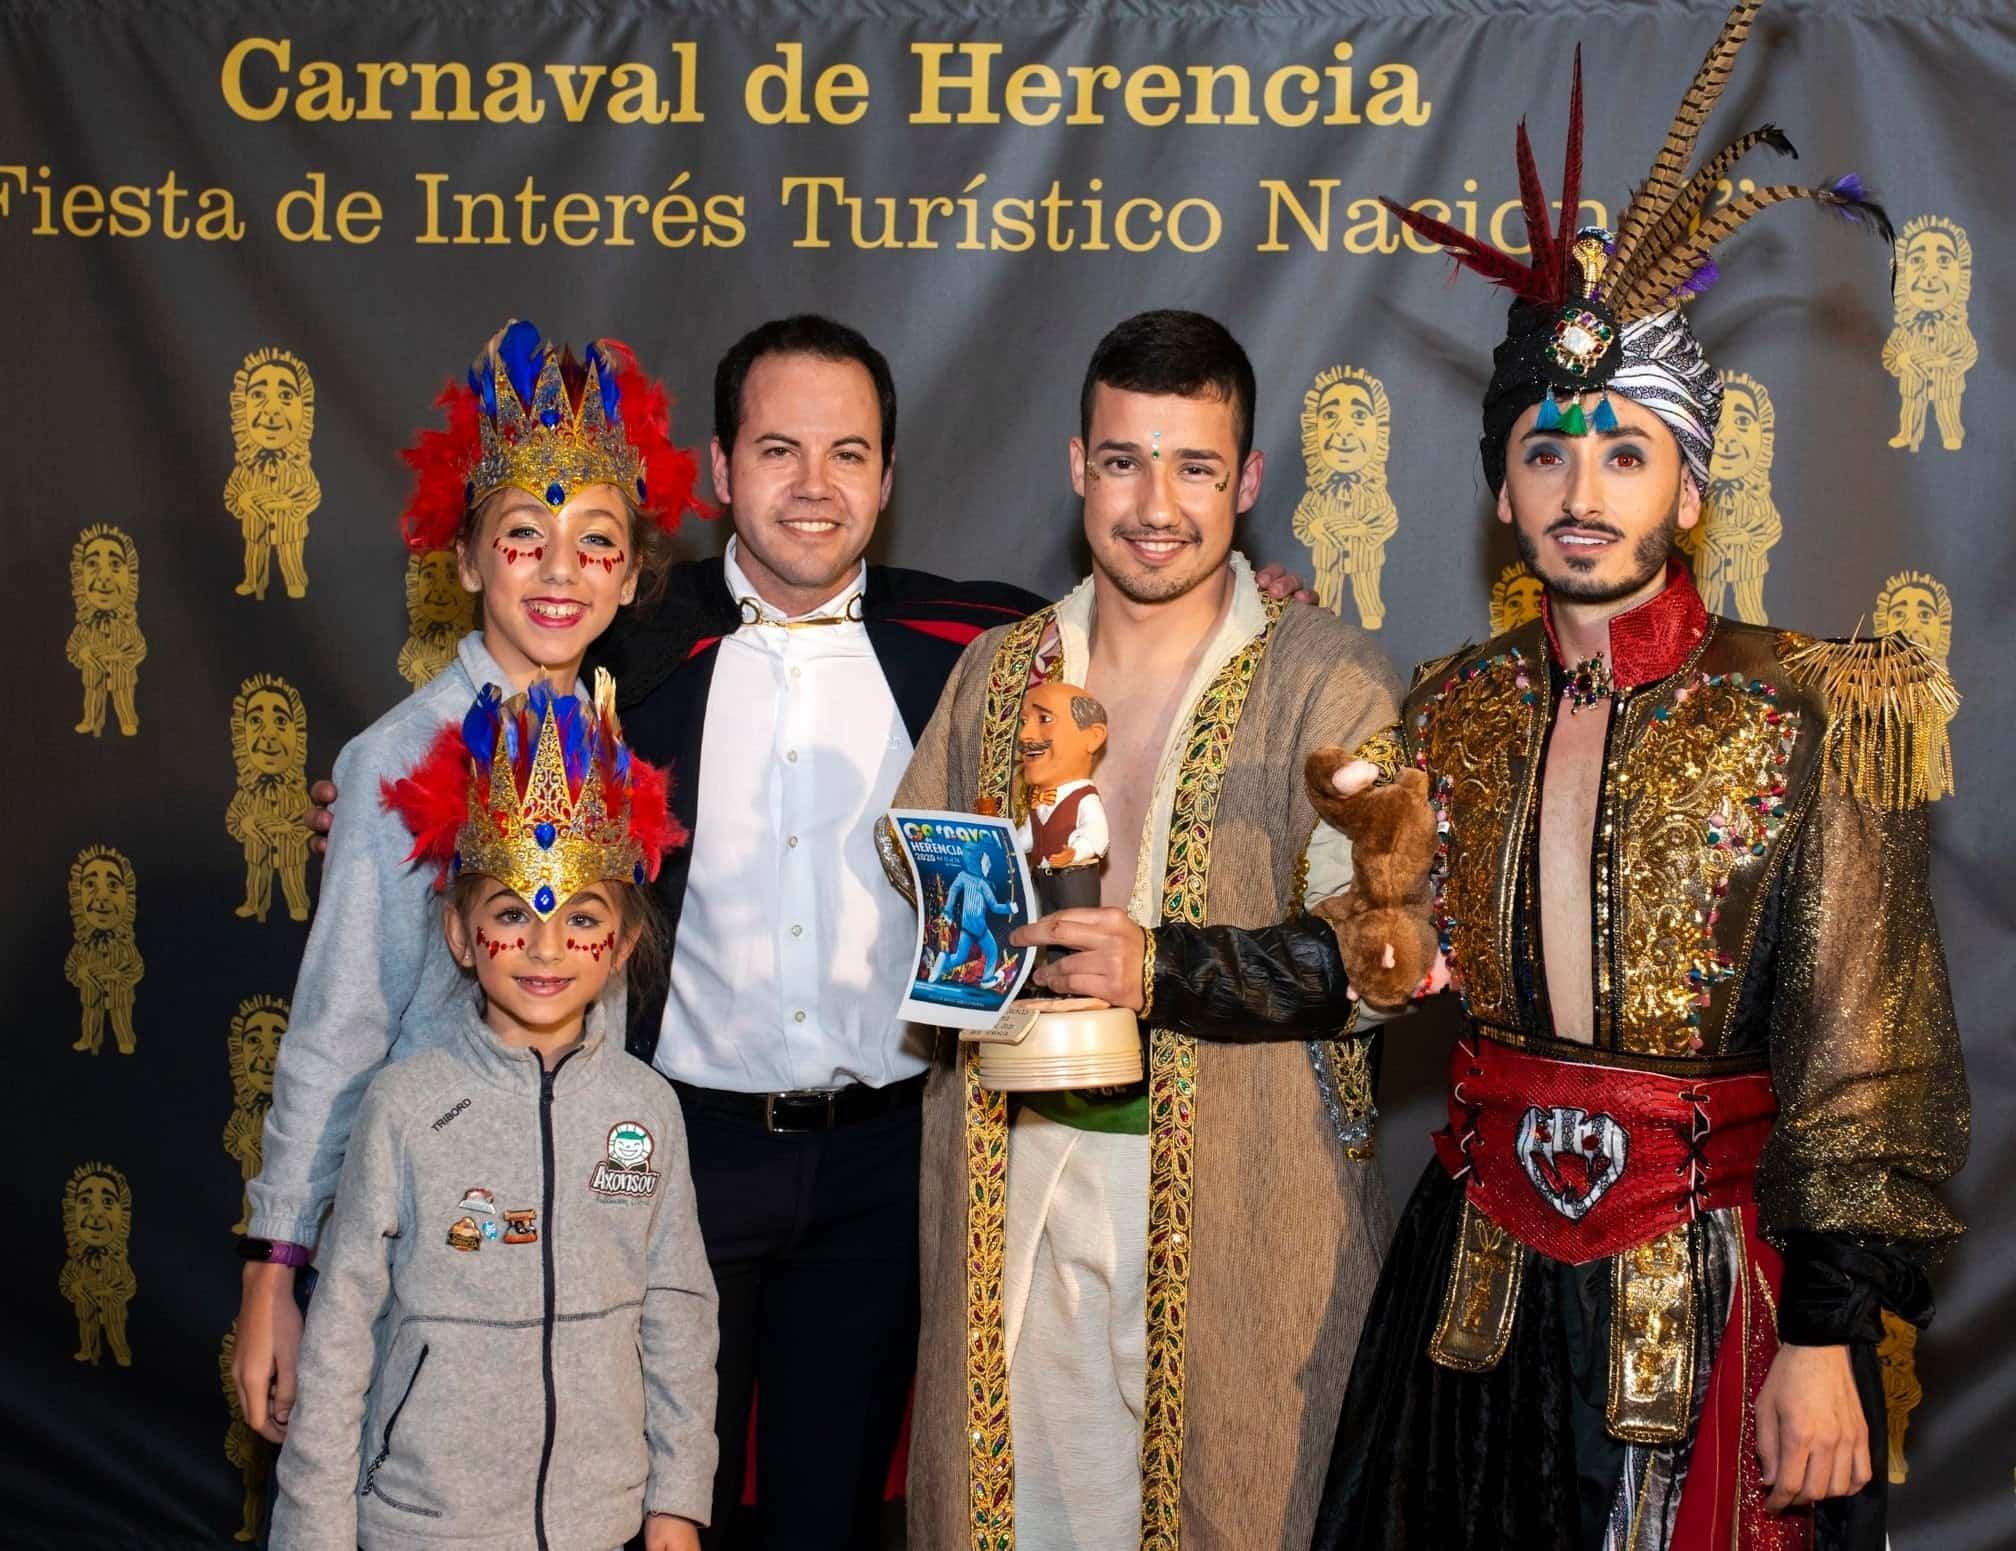 Carnaval de herencia 2020 ofertorio 62 - Selección de fotografías del Ofertorio del Carnaval de Herencia